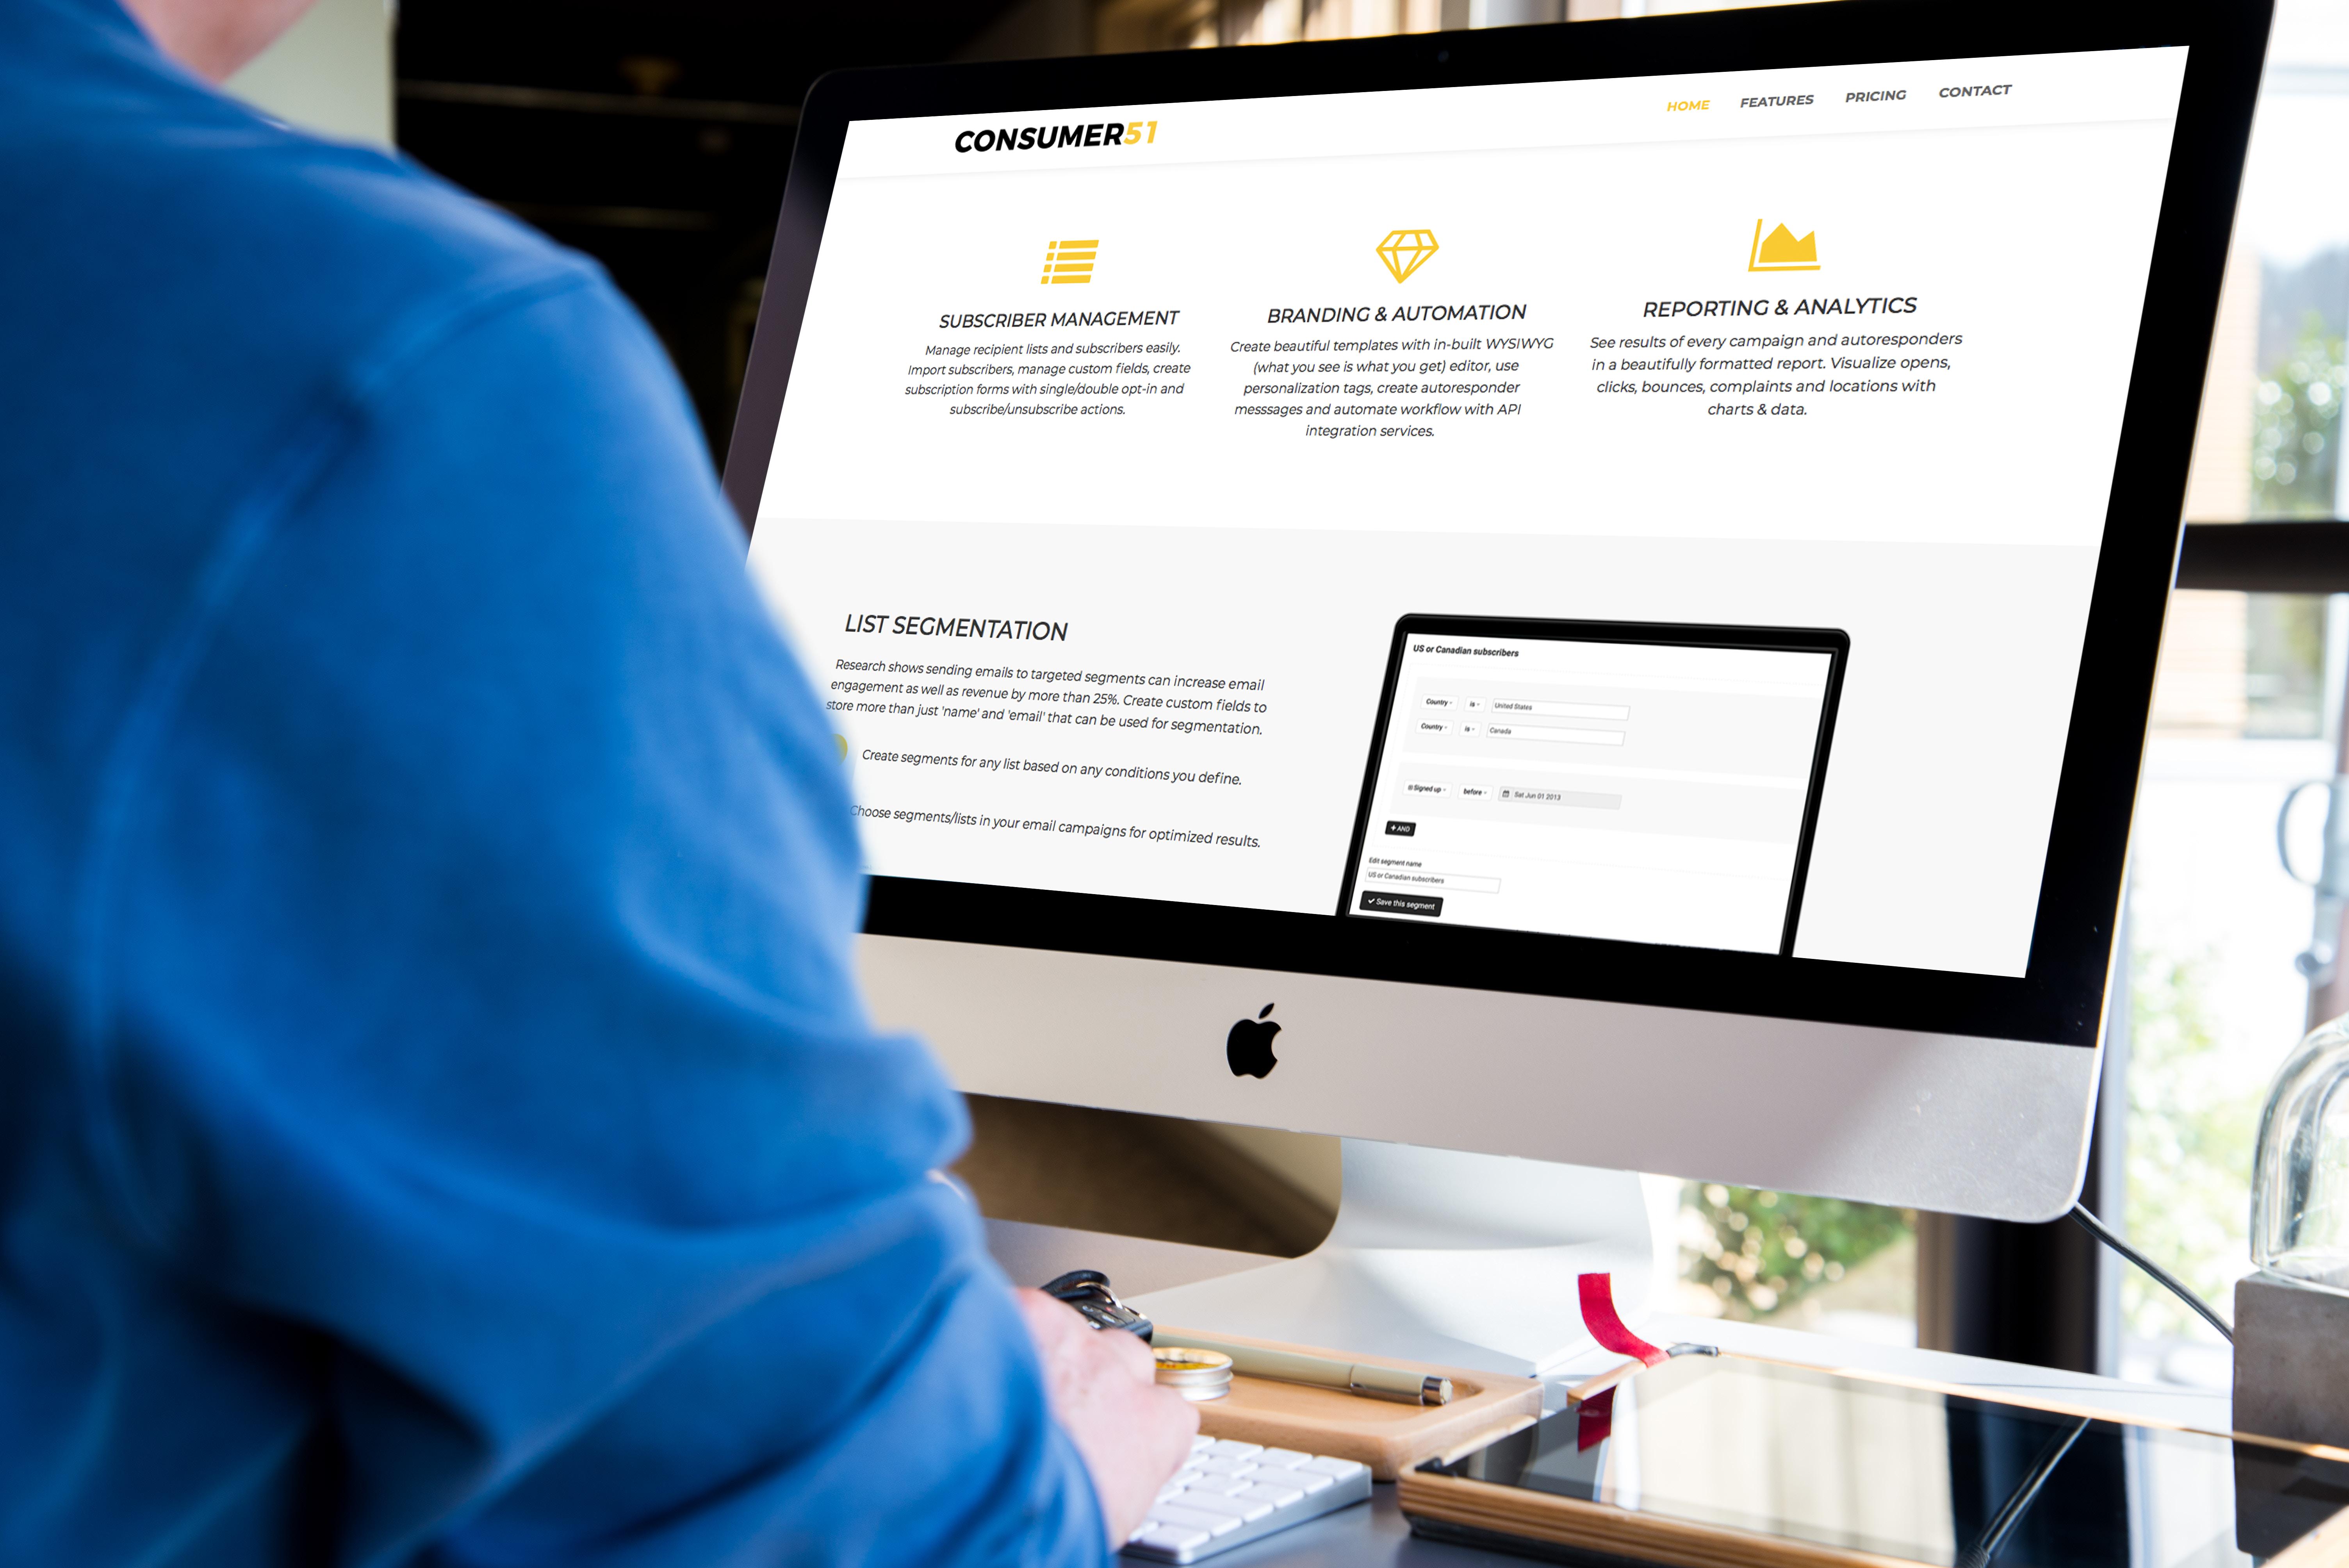 Consumer51's email marketing platform 51emails